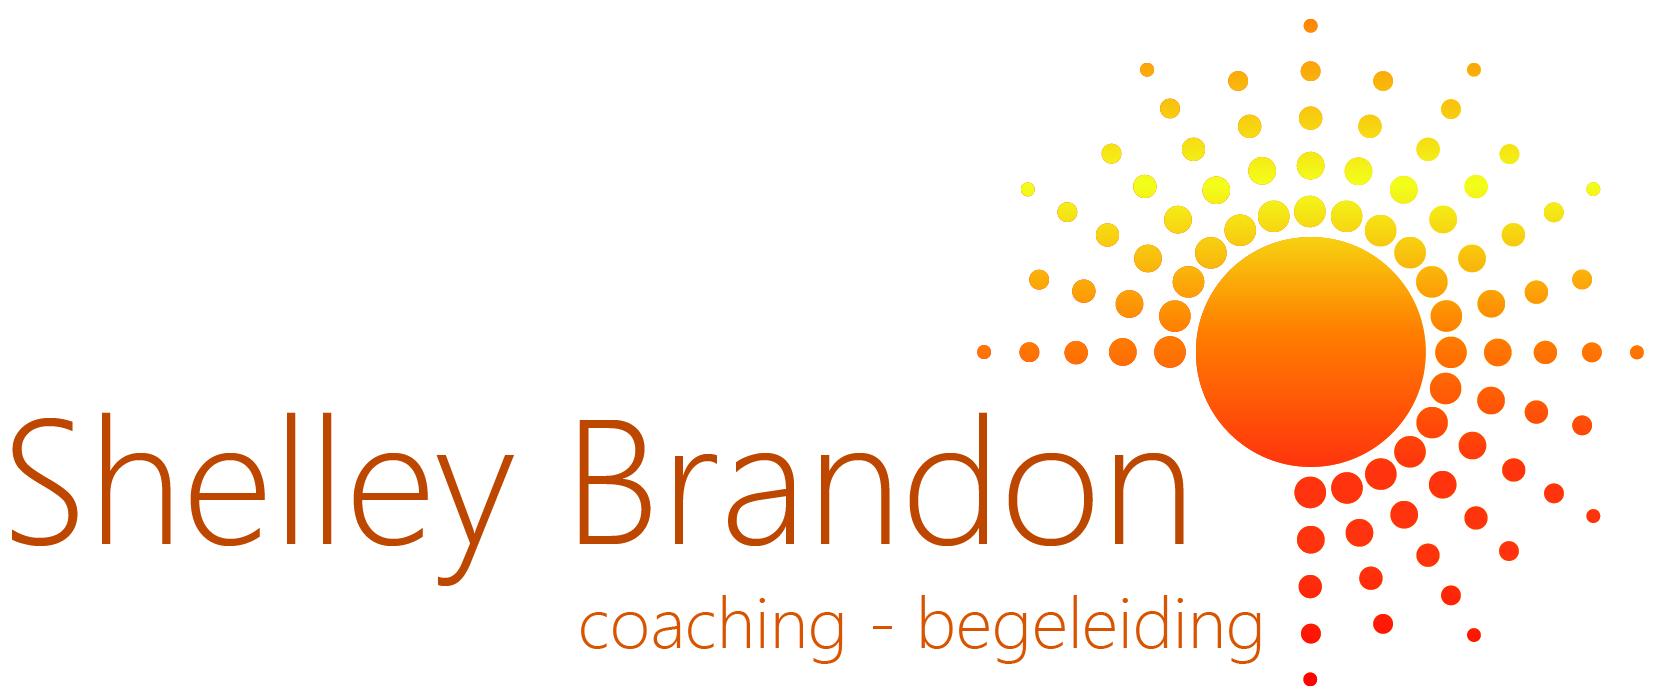 Shelley Brandon